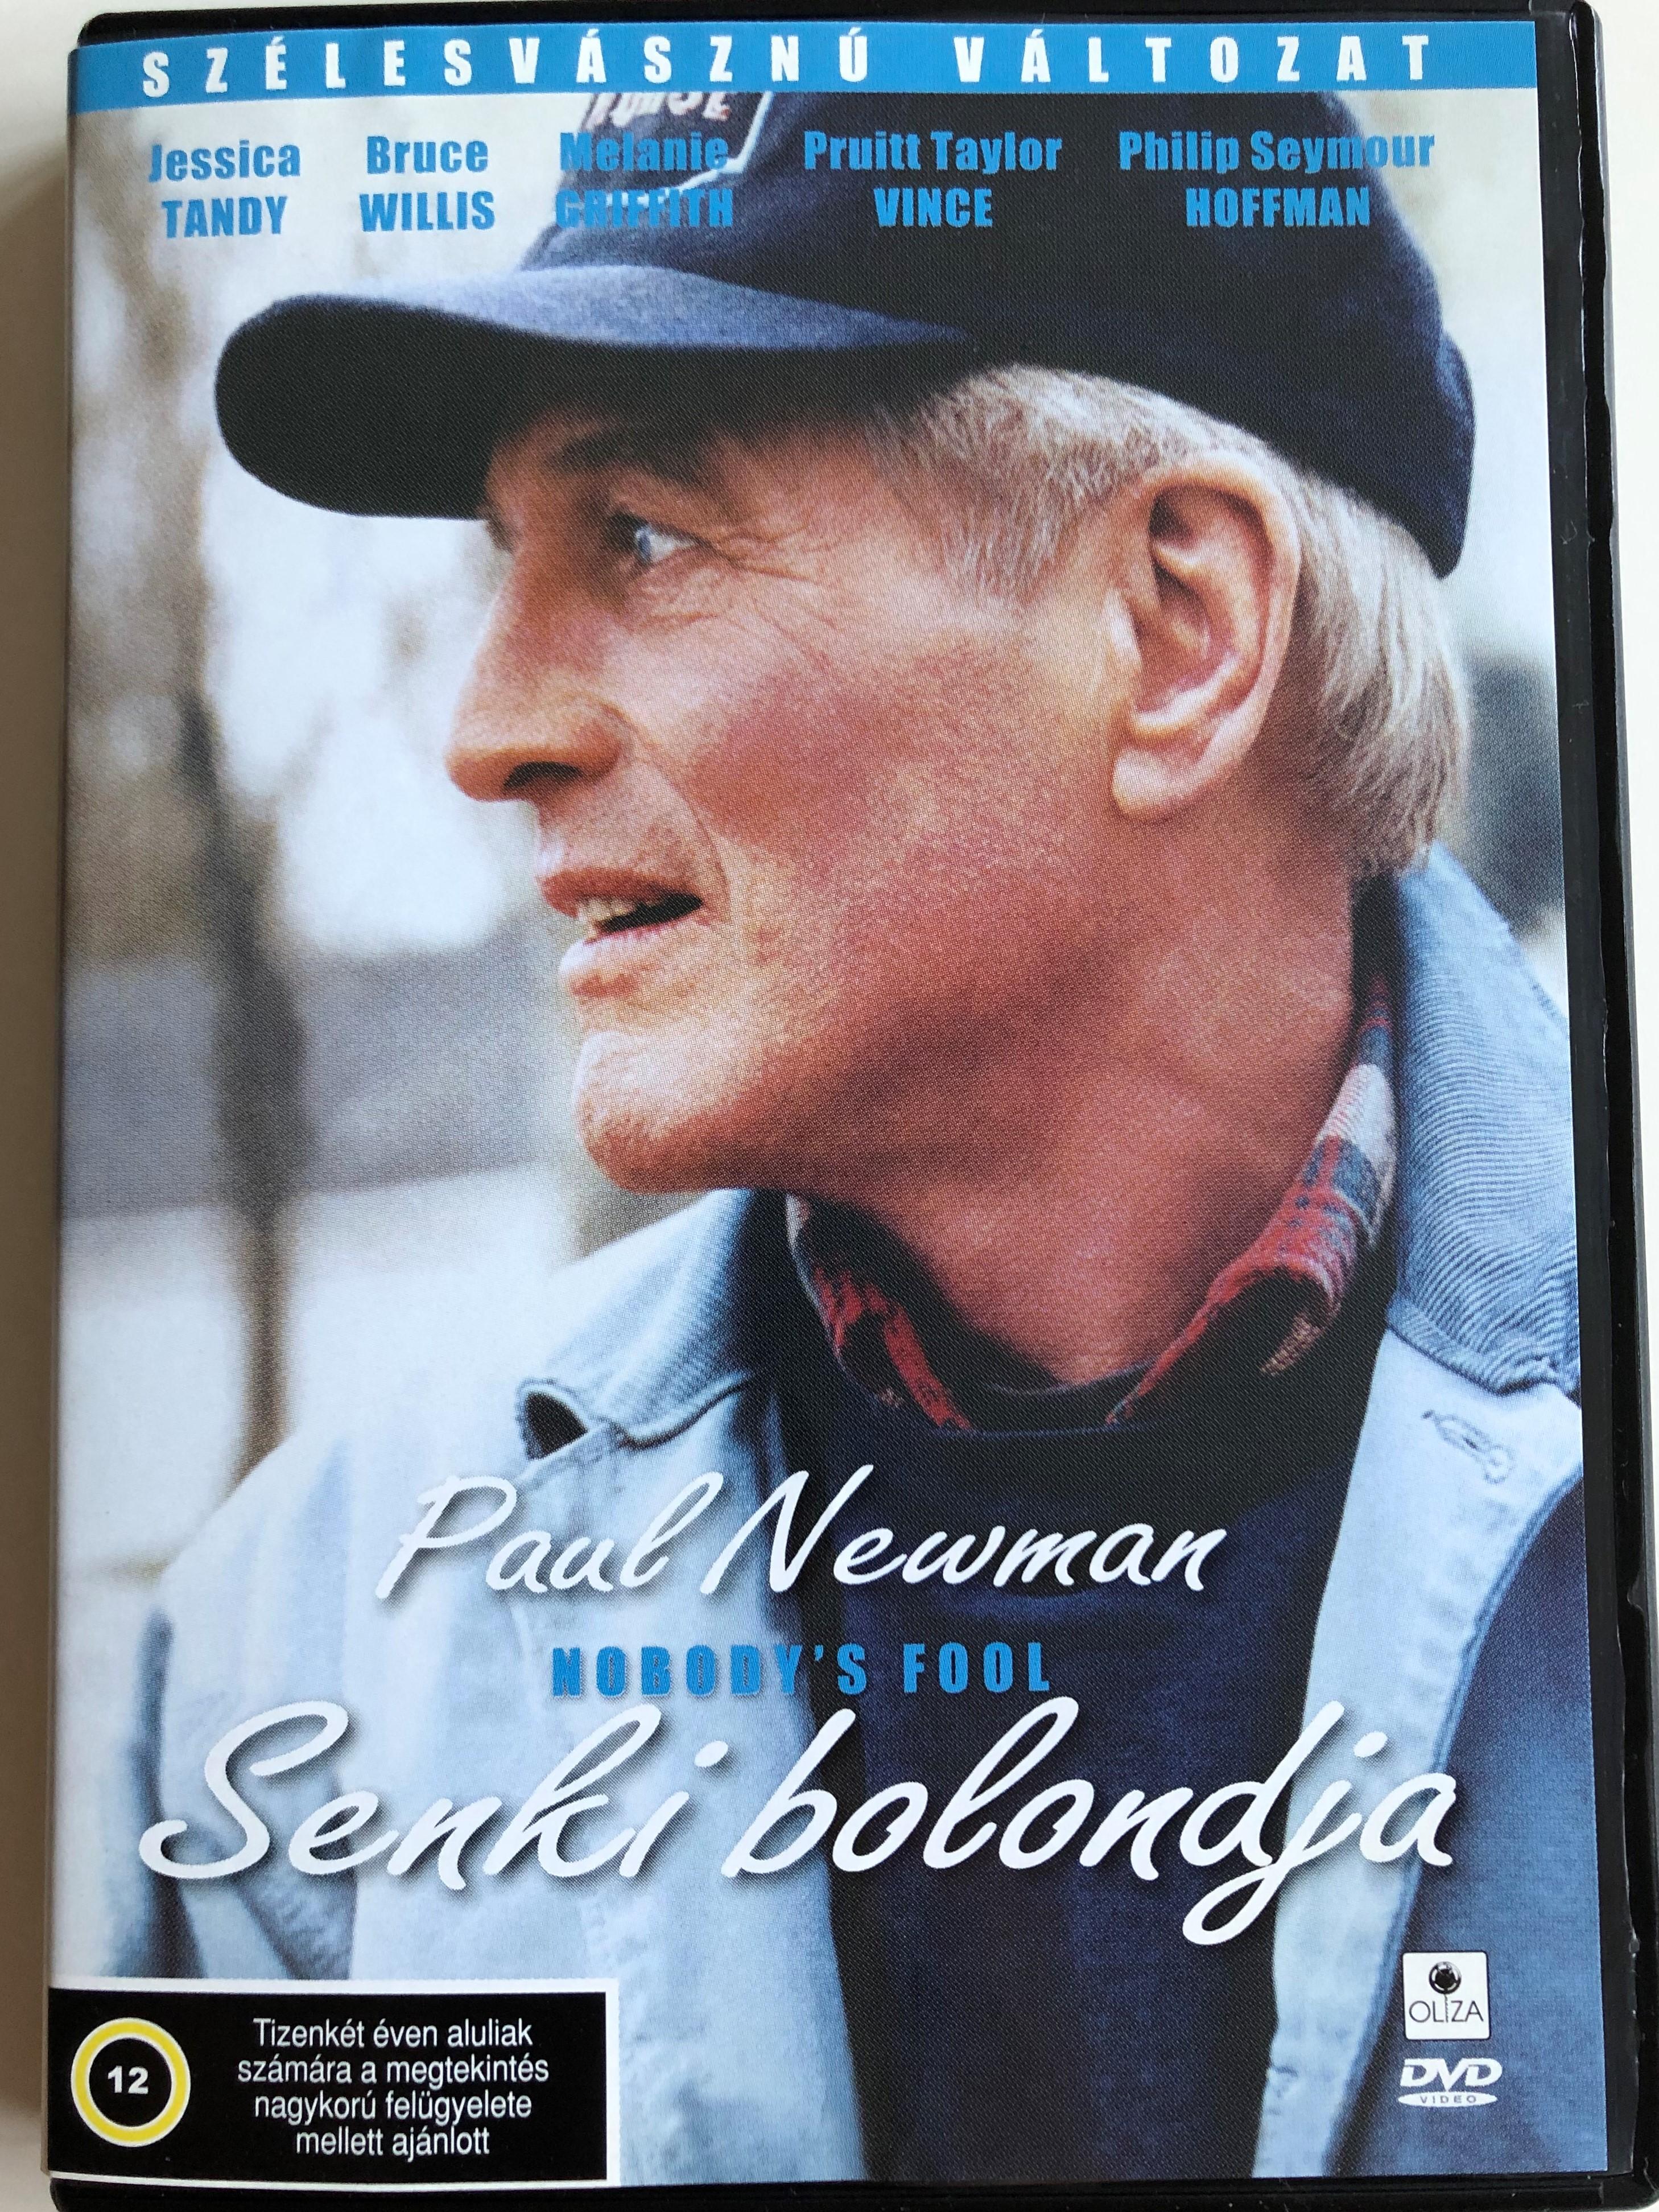 nobody-s-fool-dvd-1994-senki-bolondja-directed-by-robert-benton-starring-paul-newman-paul-newman-jessica-tandy-bruce-willis-melanie-griffith-1-.jpg